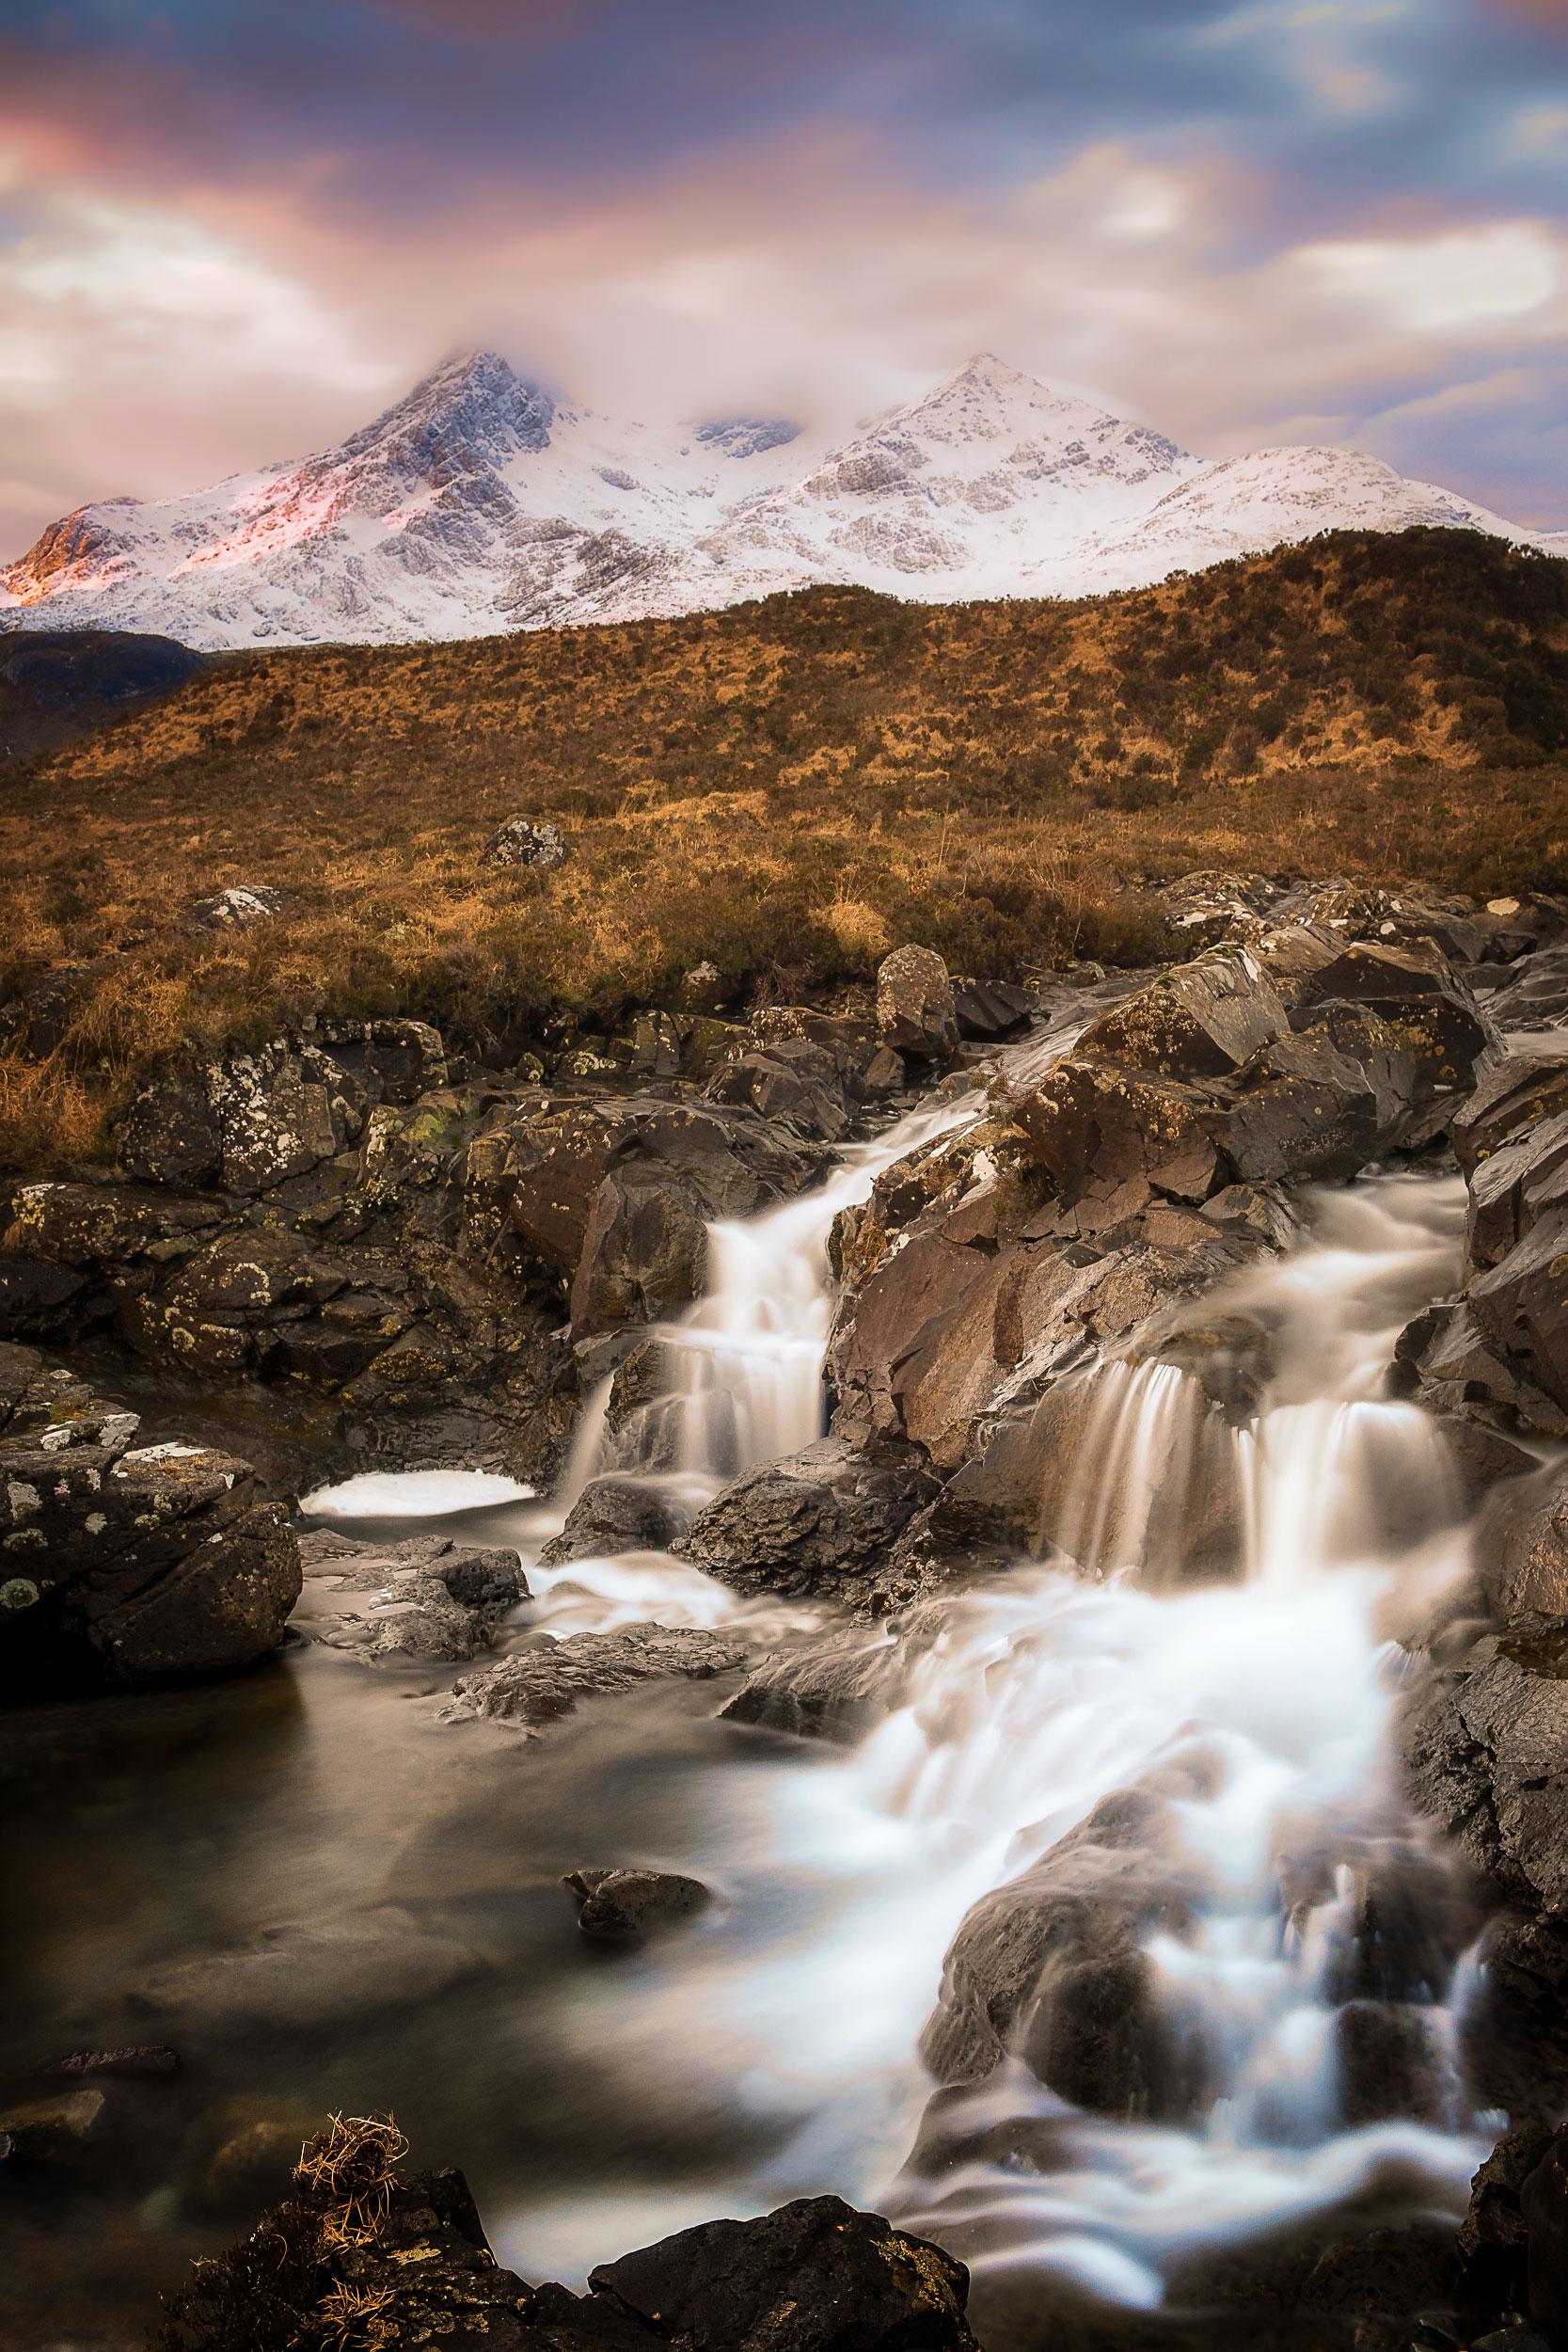 Sligachan Waterfalls, Isle of Skye